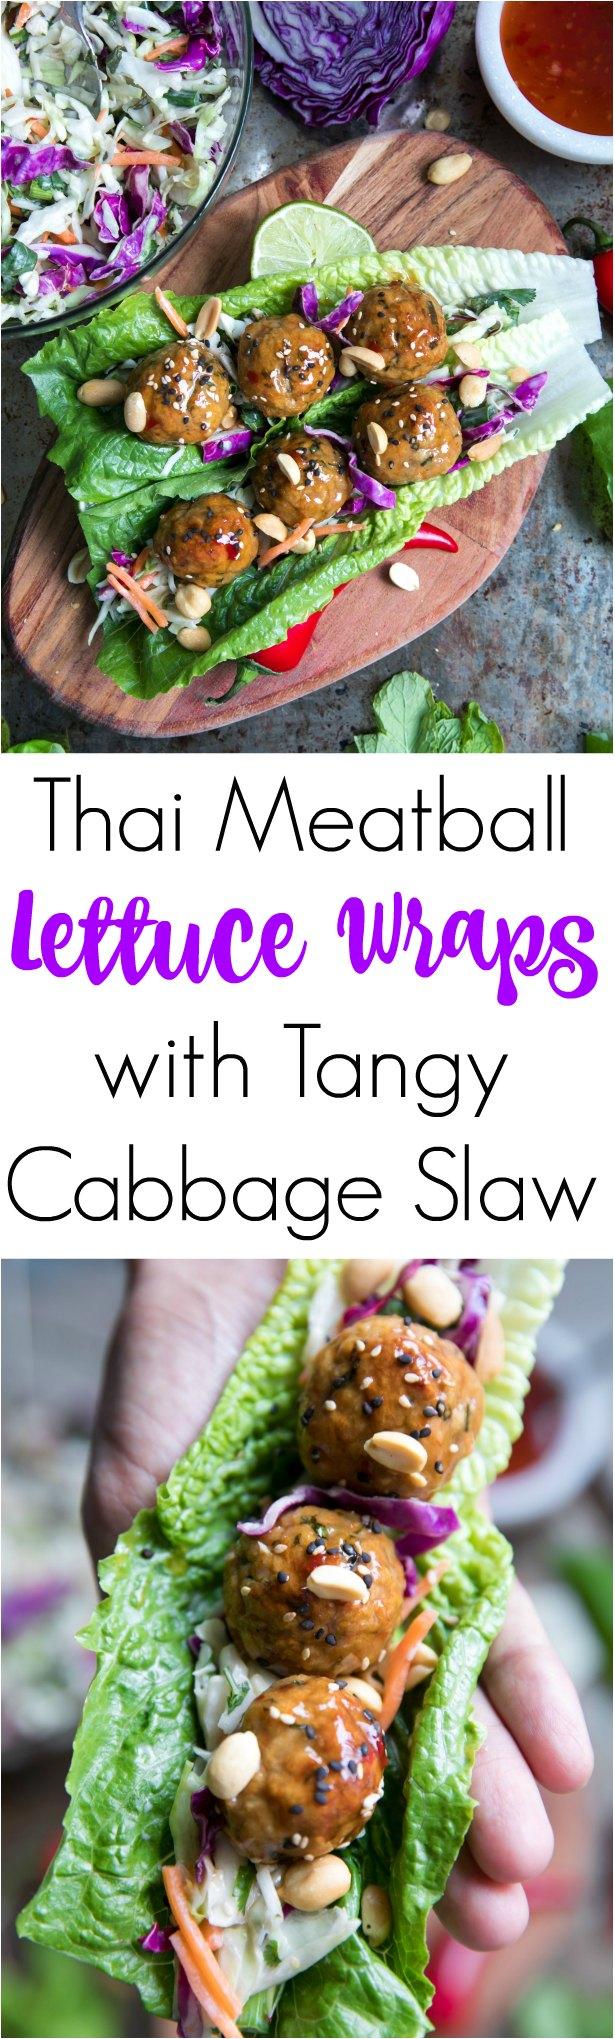 Thai Meatball Lettuce Wraps with Tangy Cabbage Slaw @theforkedspoon #lowcarb #meatballs #lettucewraps #dinner #easyrecipe #peanuts #thai